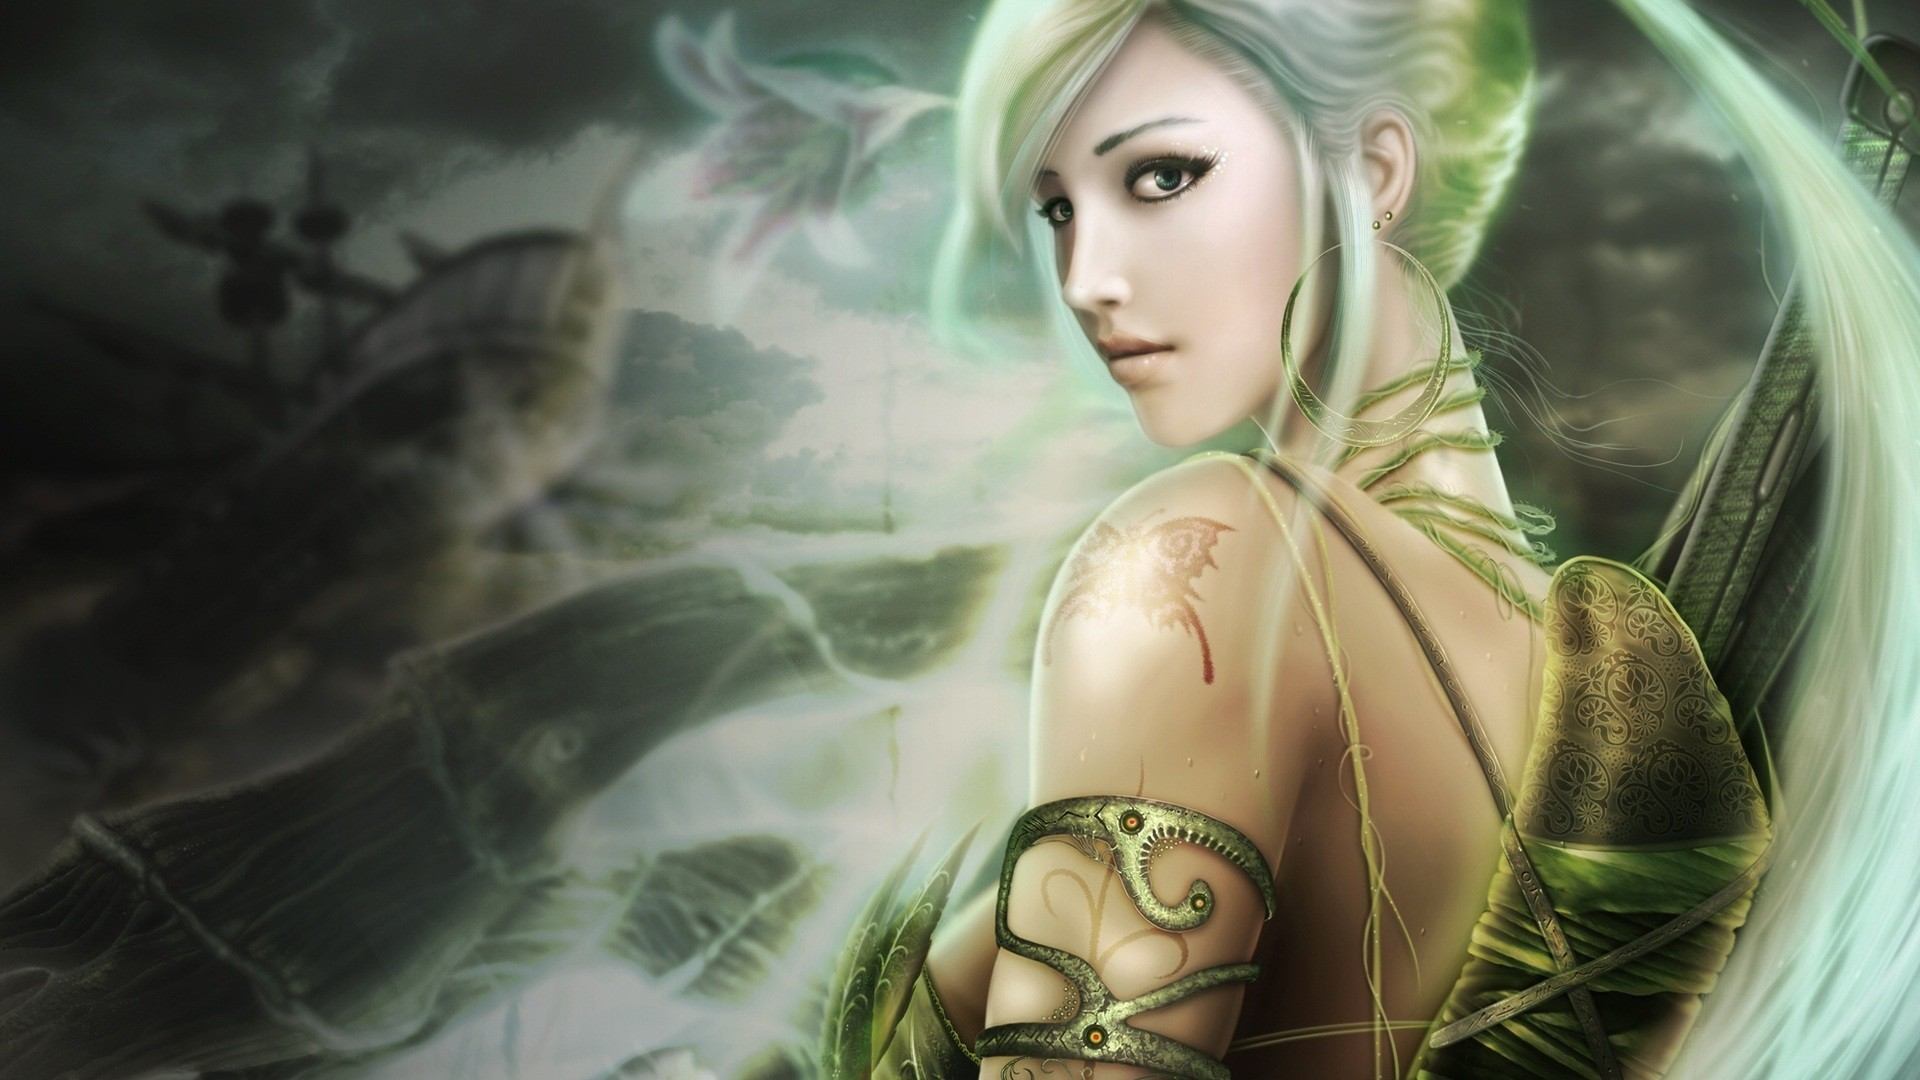 Female Fantasy Wallpaper 66 Images